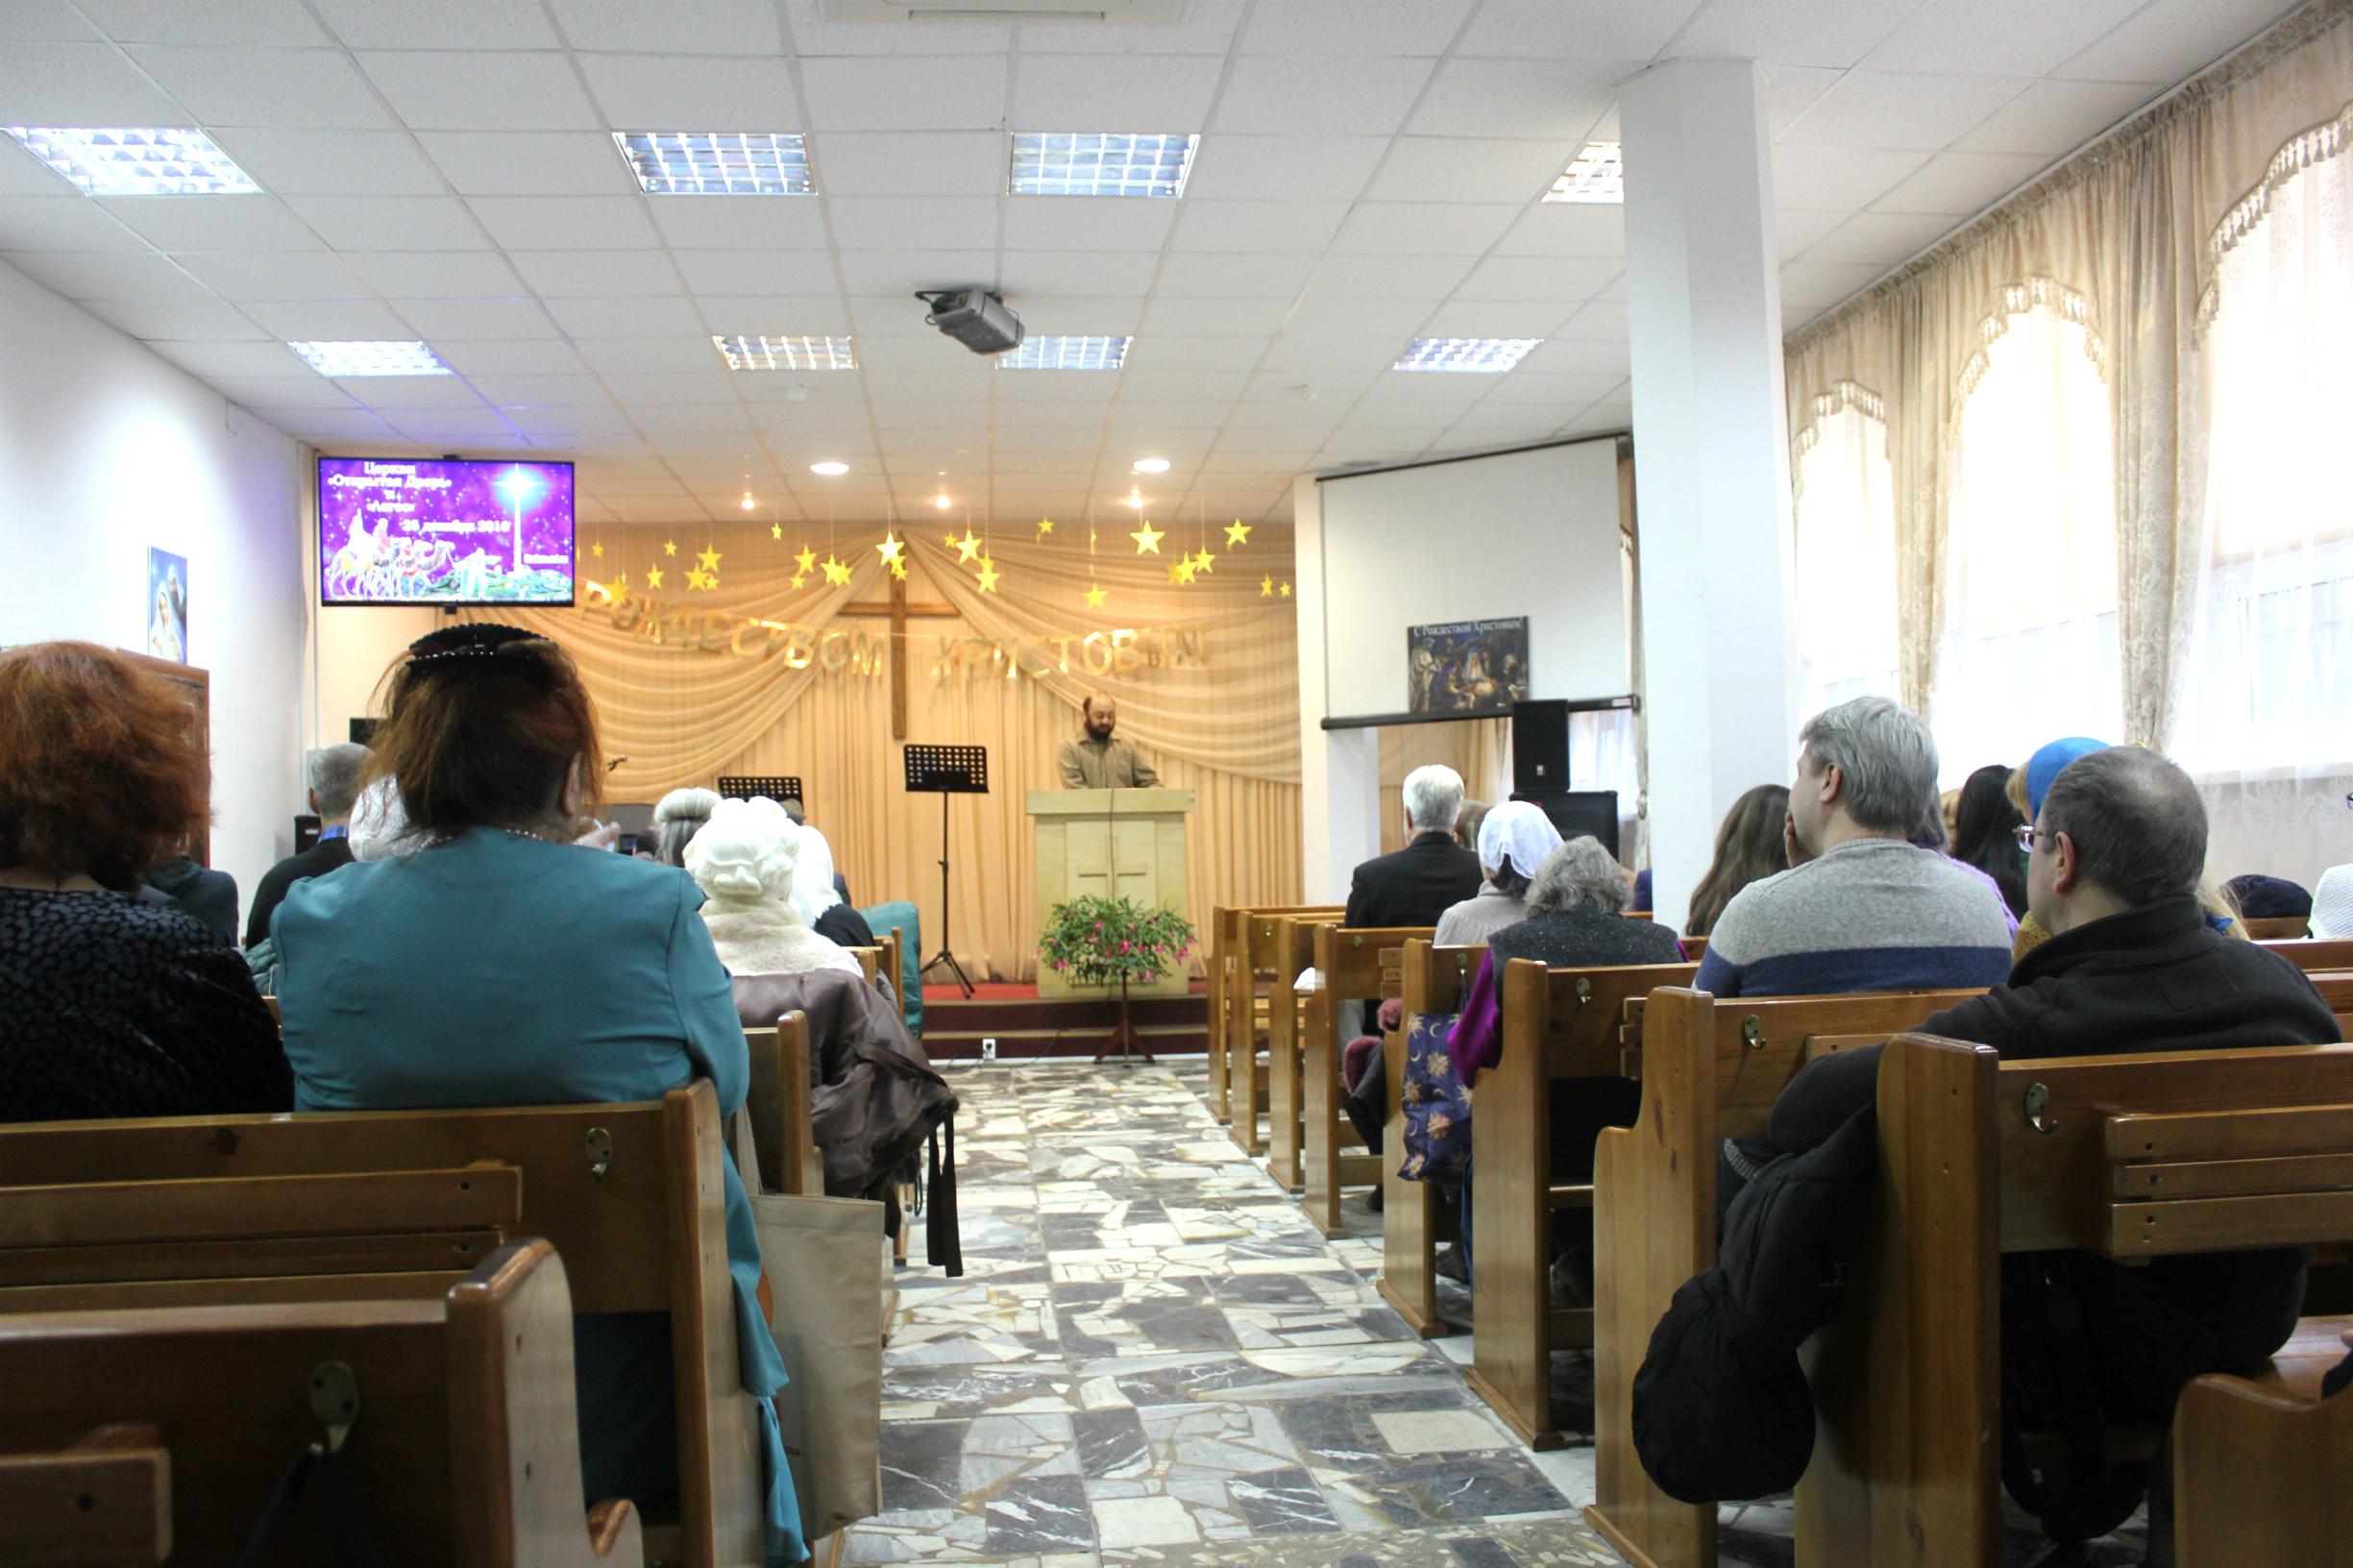 Церковь ХВЕ «Открытая дверь»